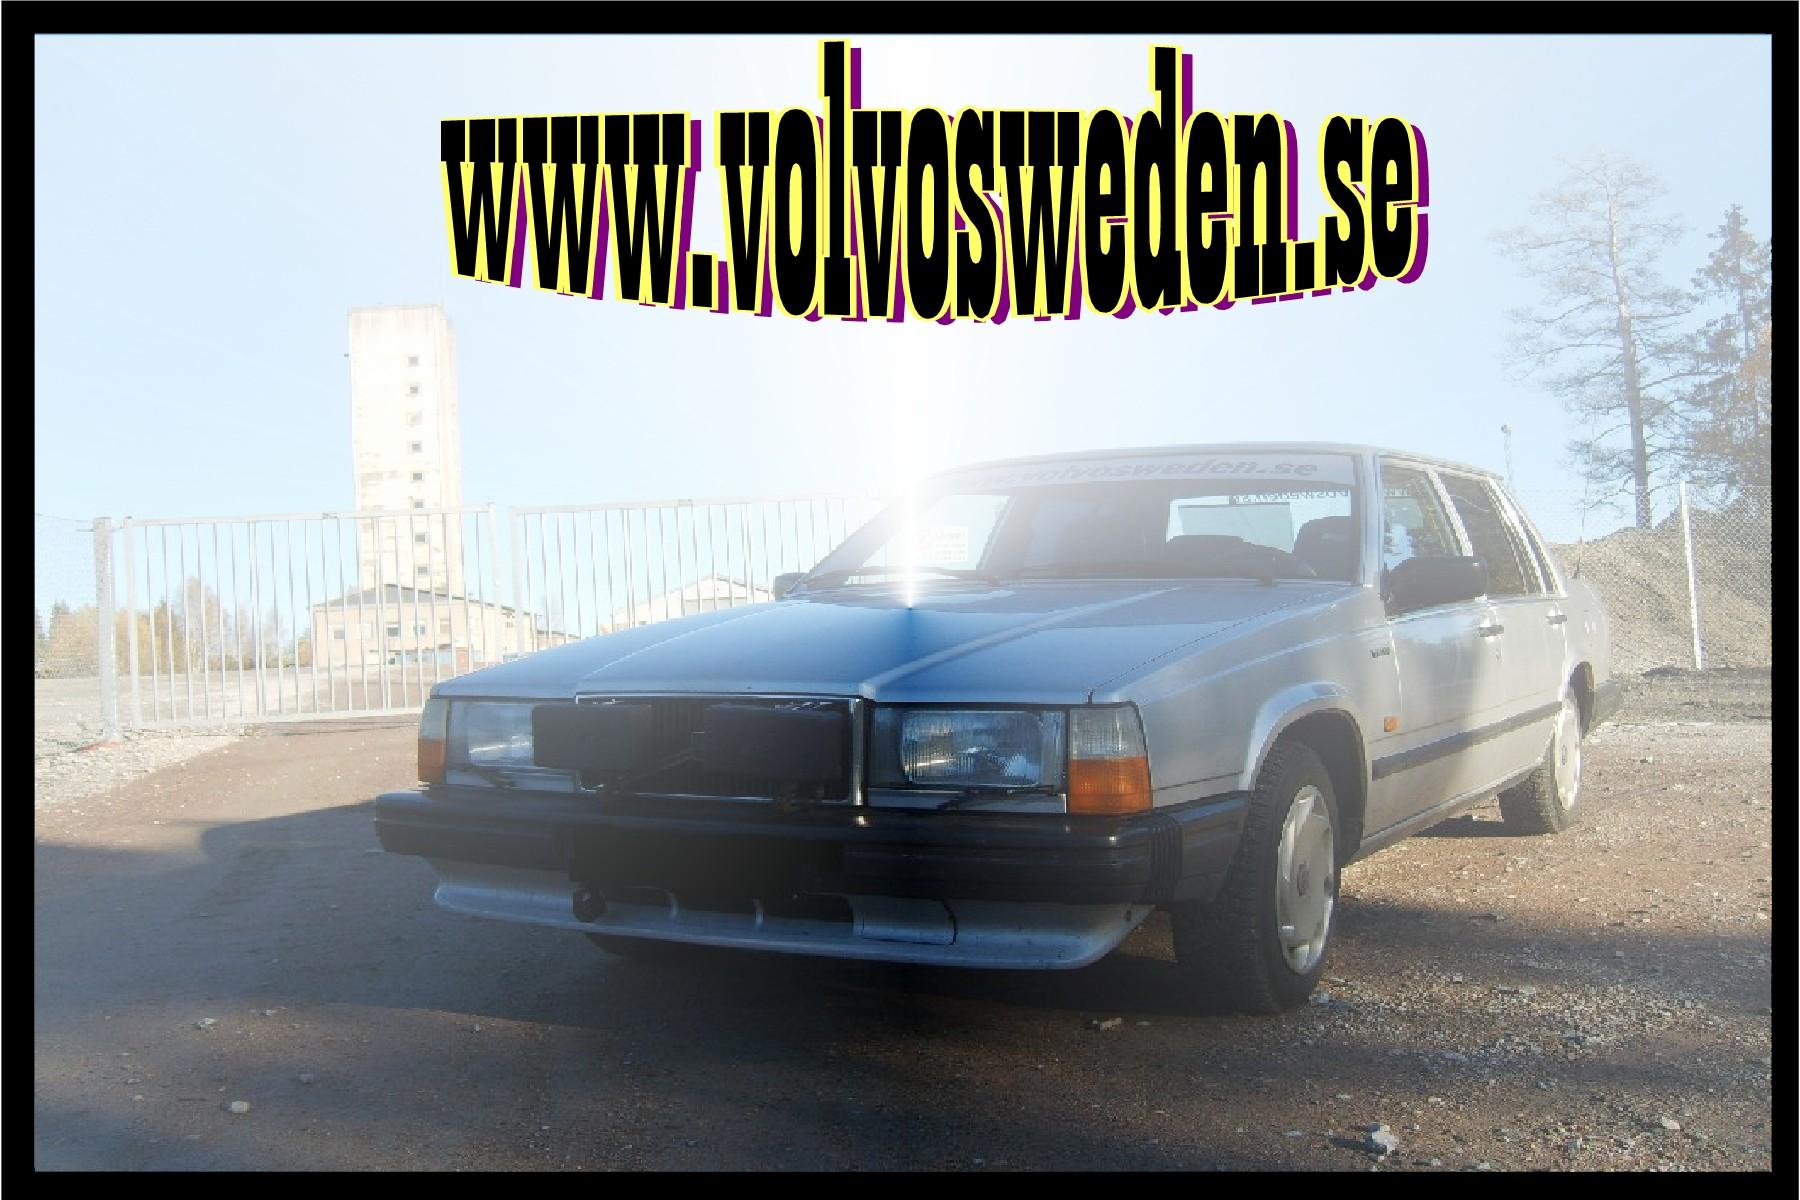 dl.dropboxusercontent.com/s/shc4l1b1lrx3j02/002_1.jpg